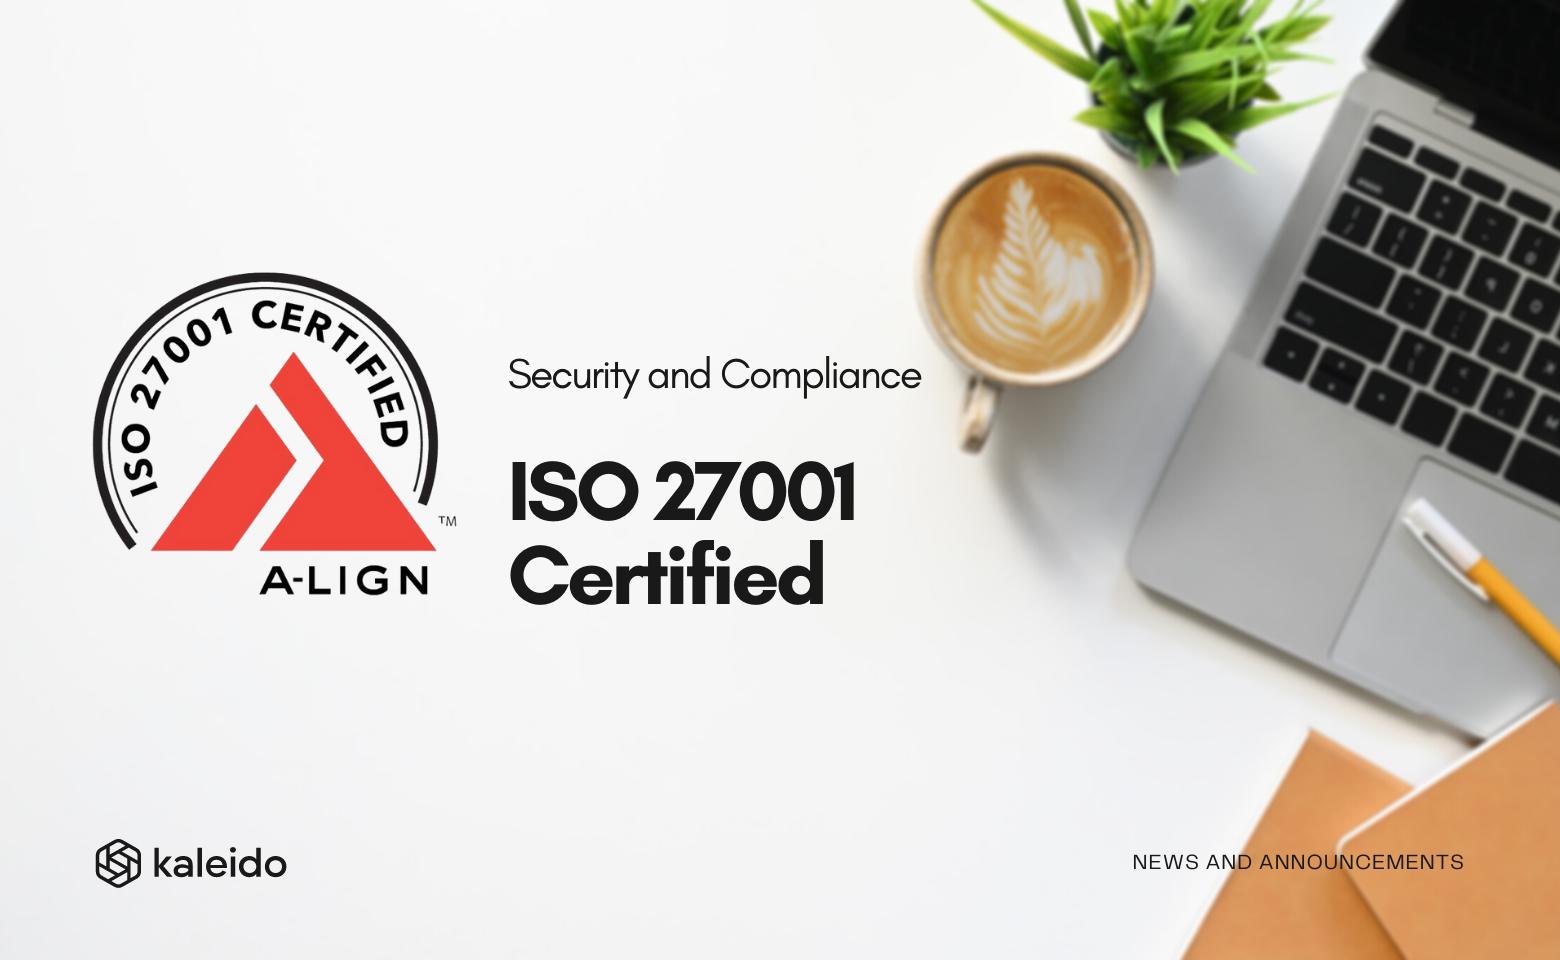 Kaleido Blockchain Platform Achieves ISO 27001 Certification